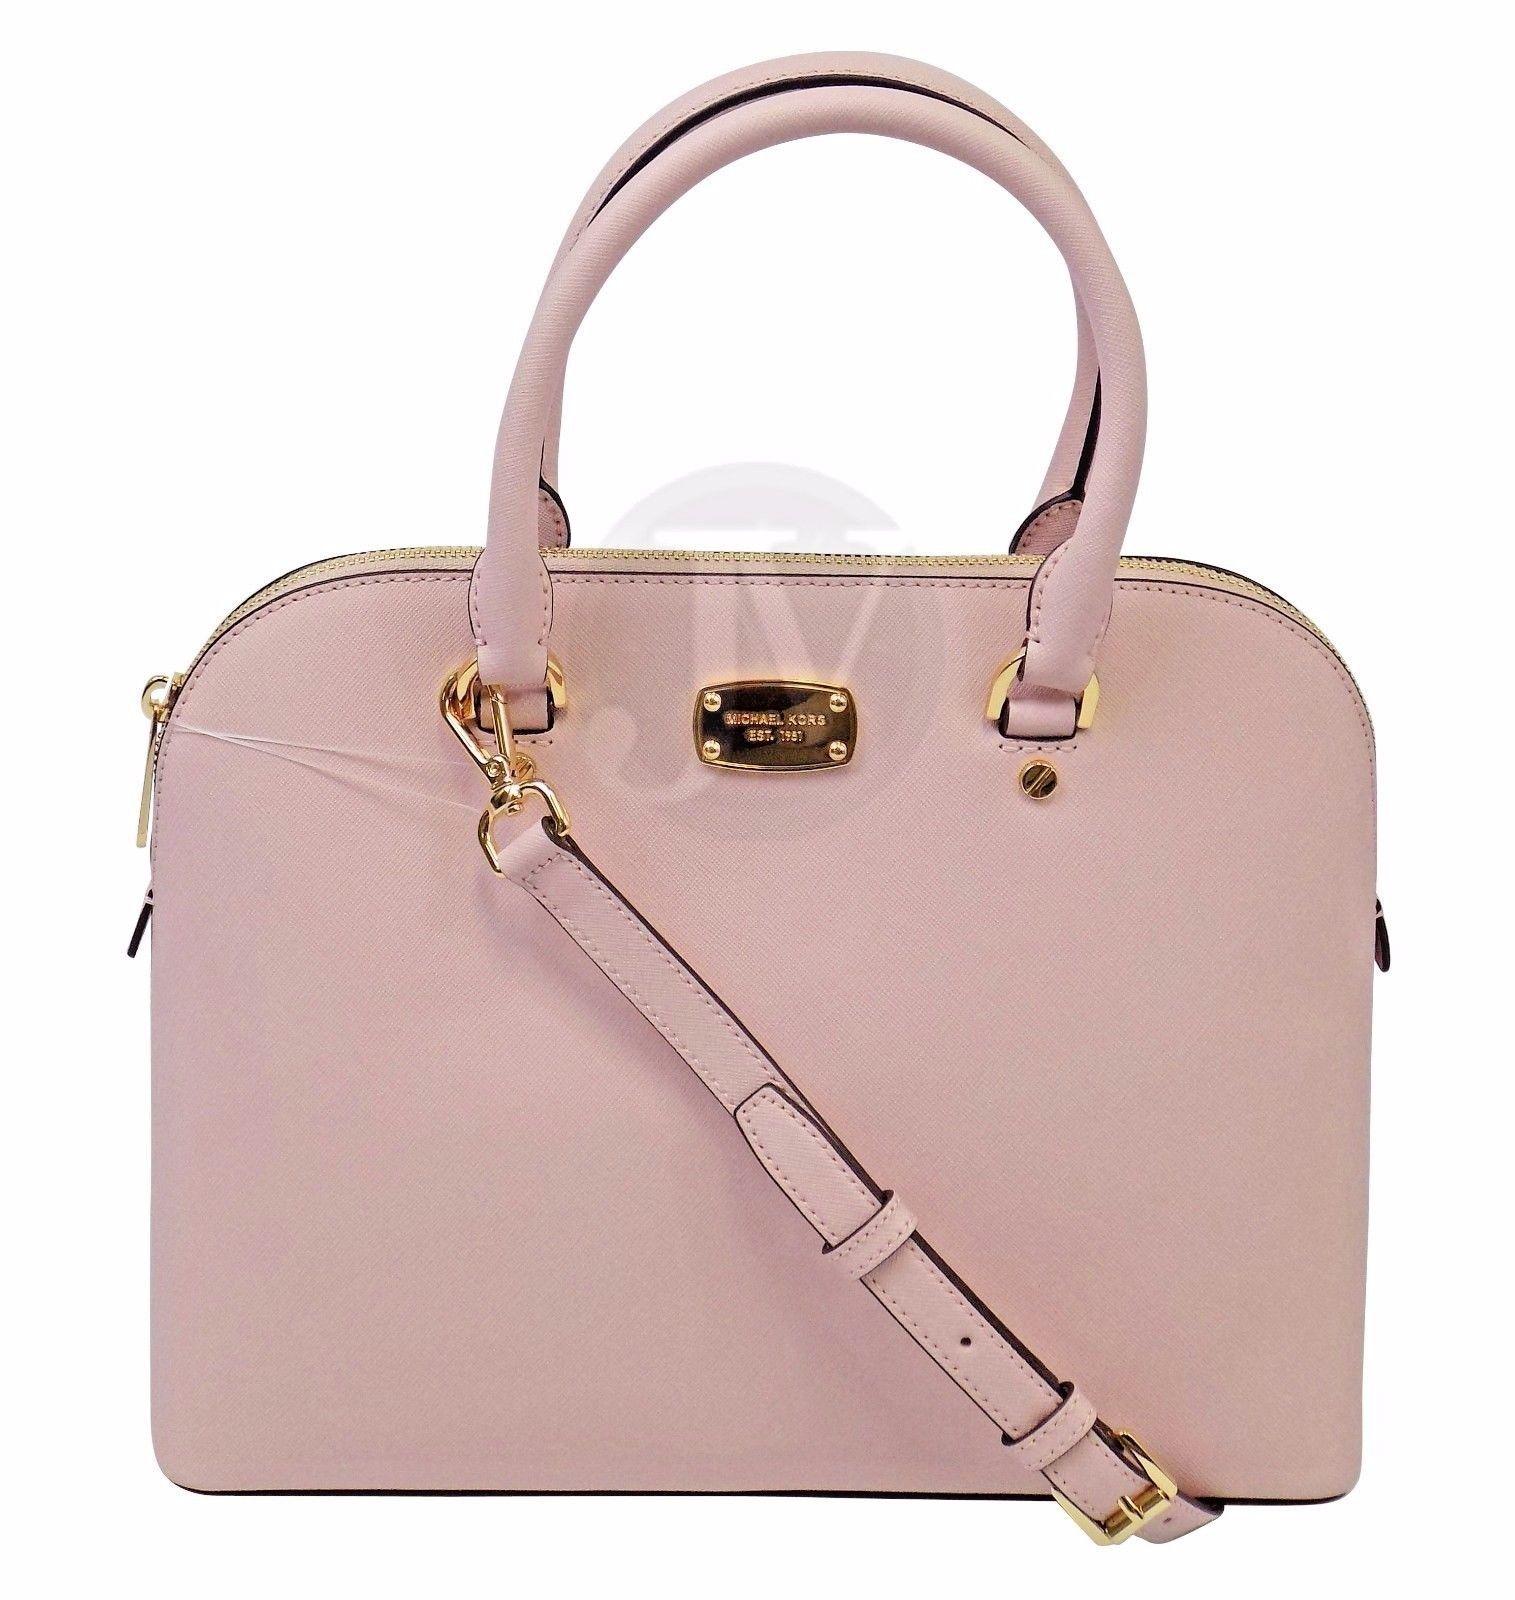 8dc761b00d ... best price new michael kors cindy large dome satchel blossom pink leather  bag crossbody 7c233 efe3d